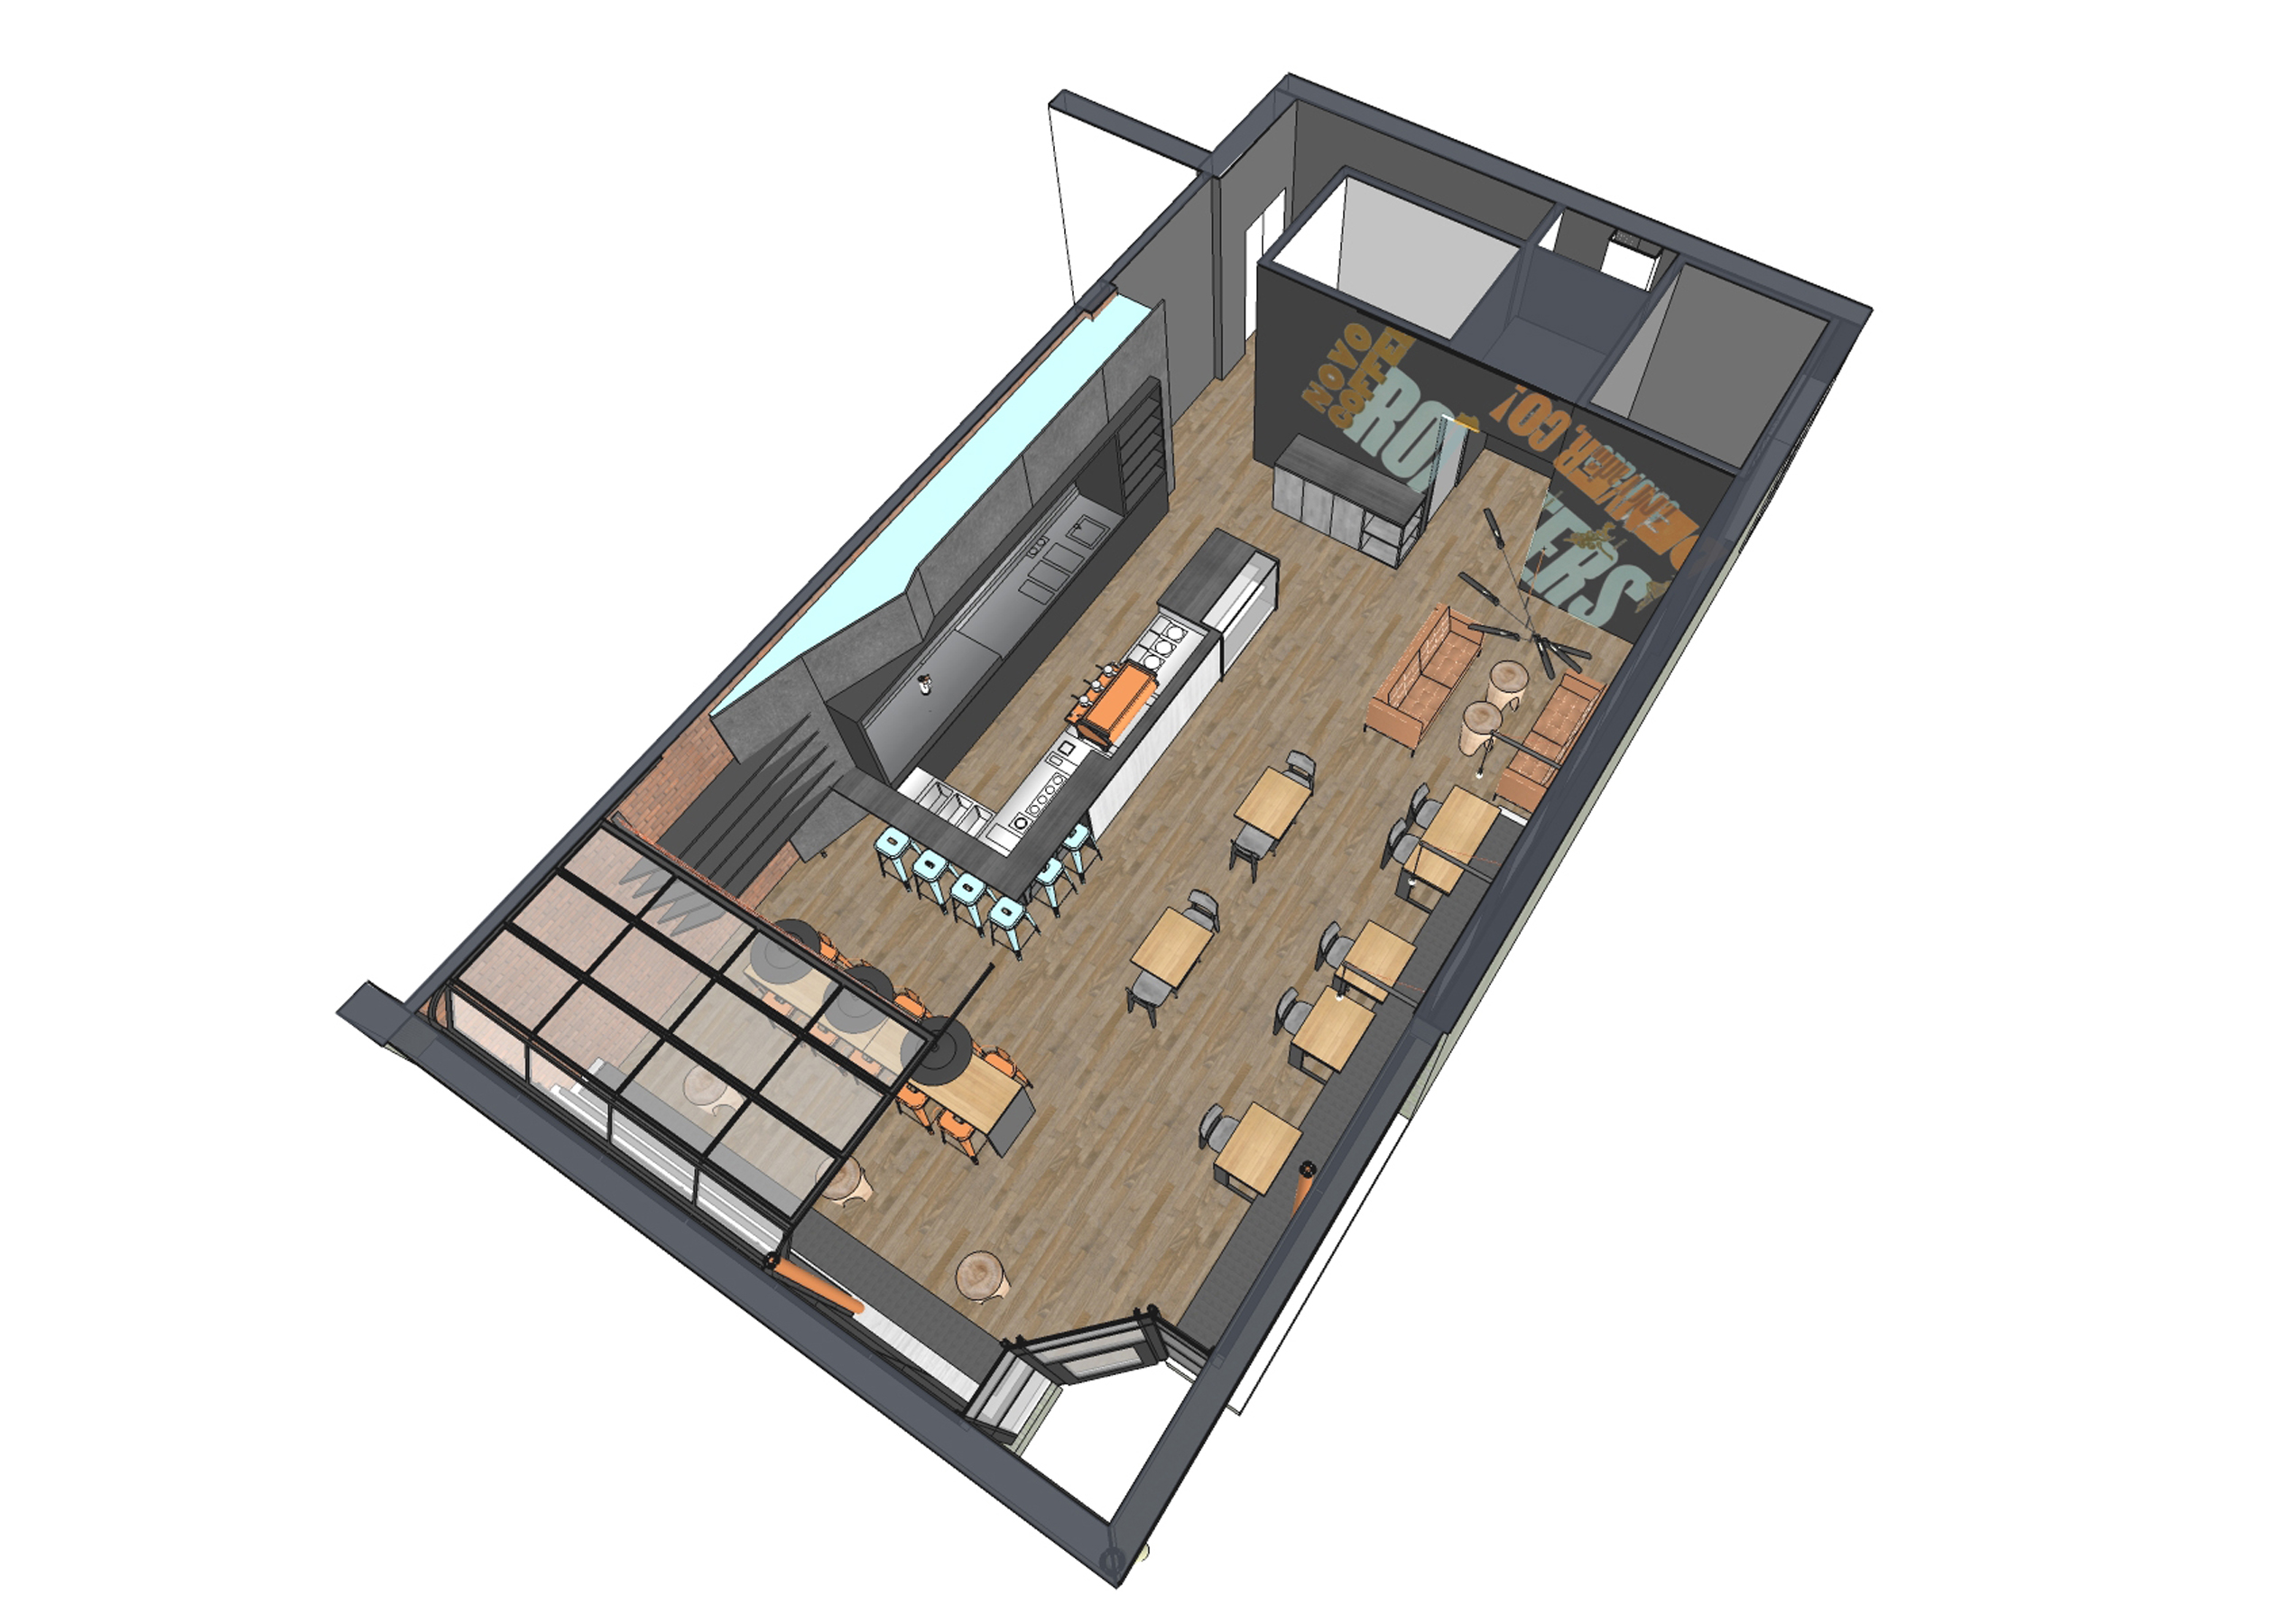 Novo Coffee shop 6th & Gilpin Axo Plan open studio architecture OSA